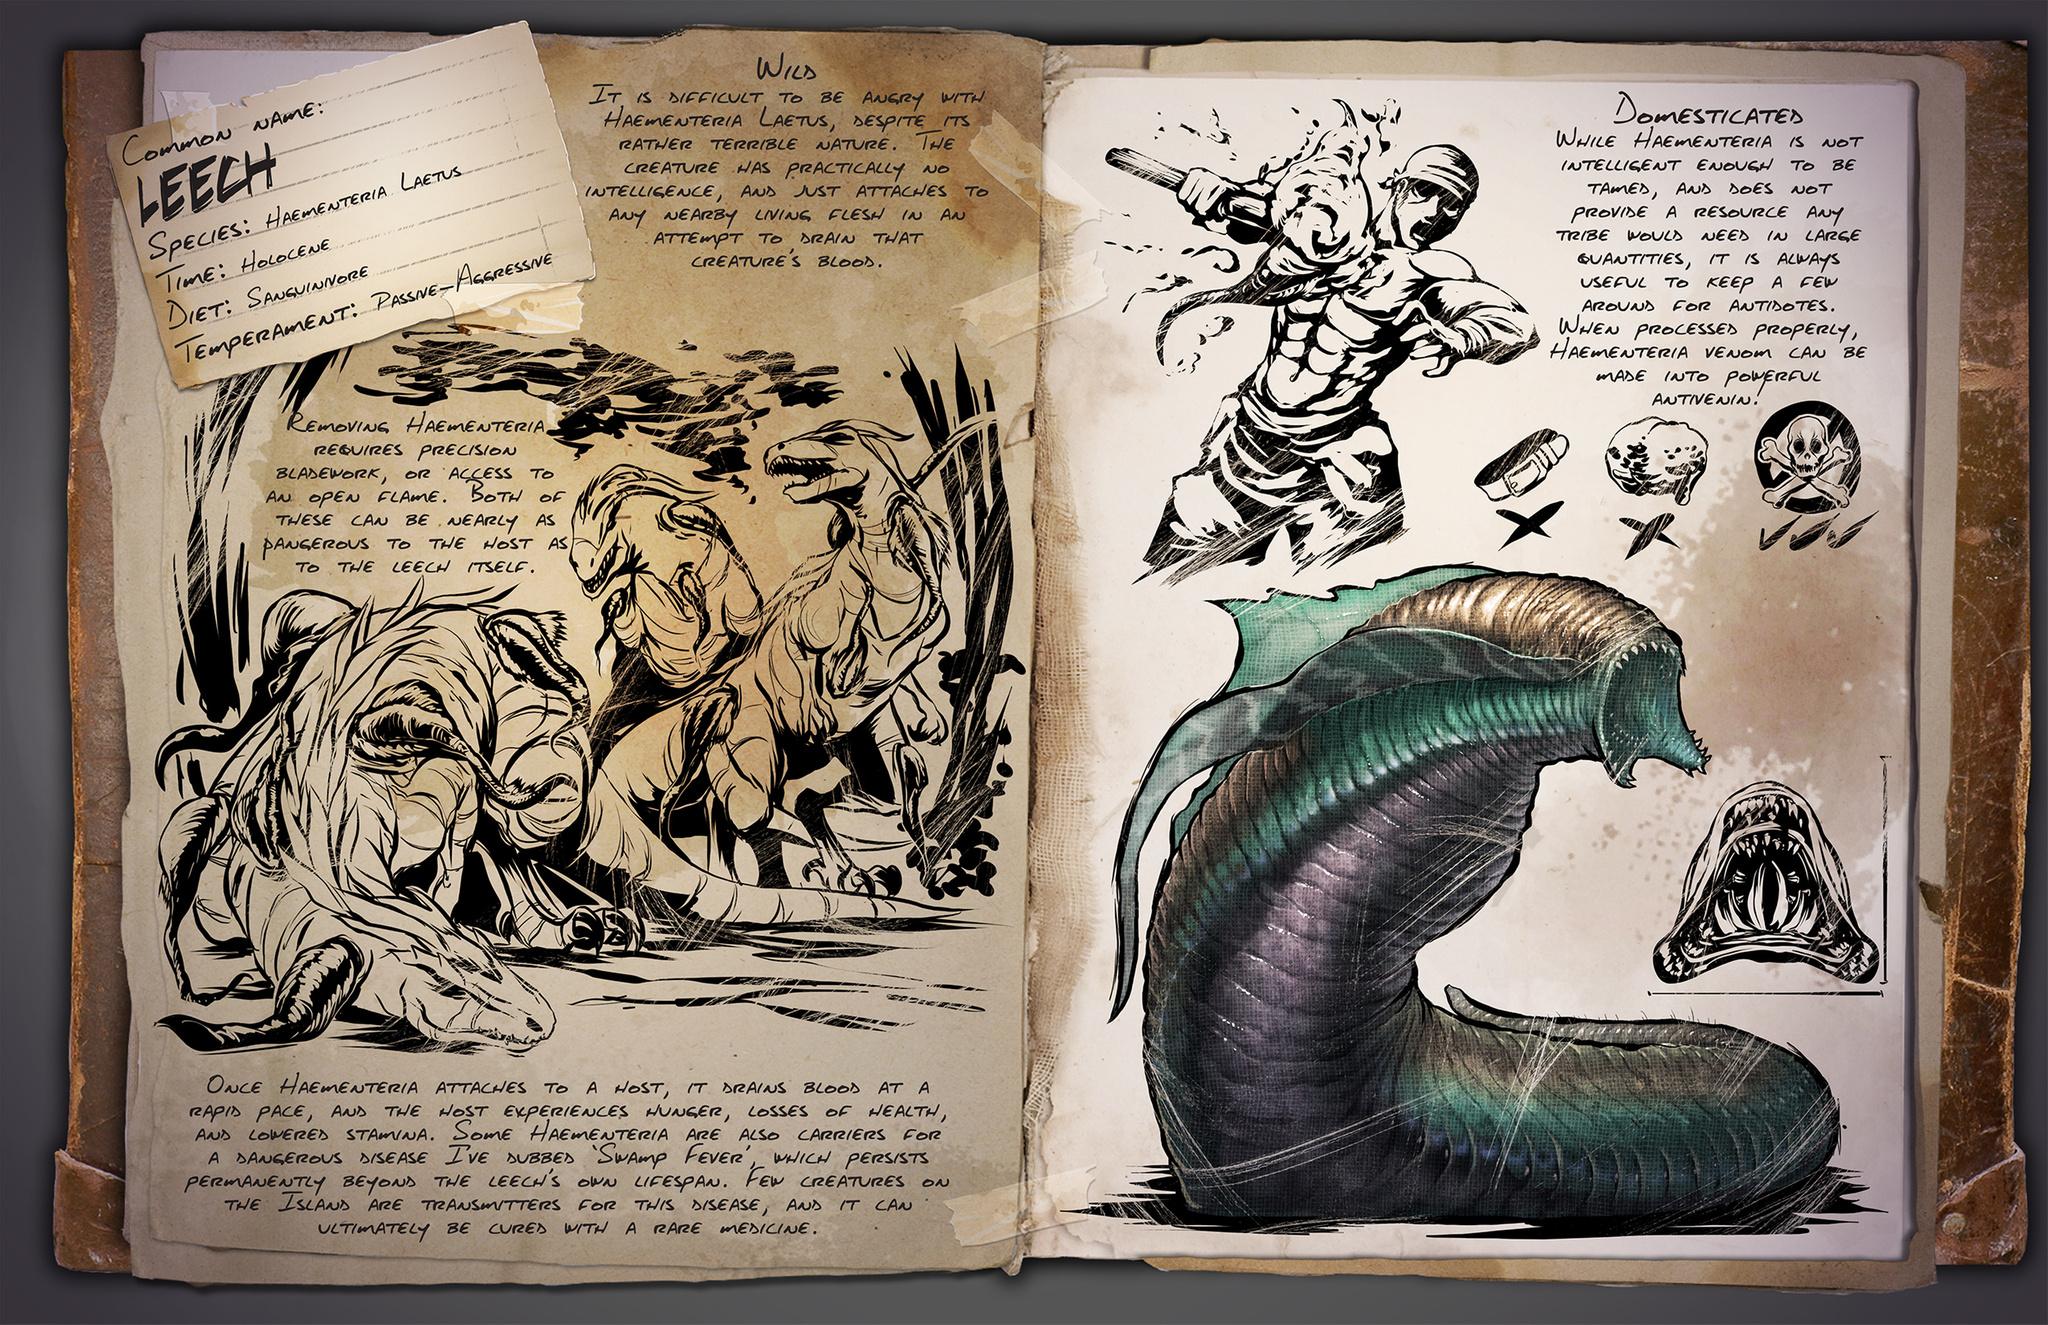 Leech (Blutegel) - Wiki - Ark Survival Evolved Forum und Community